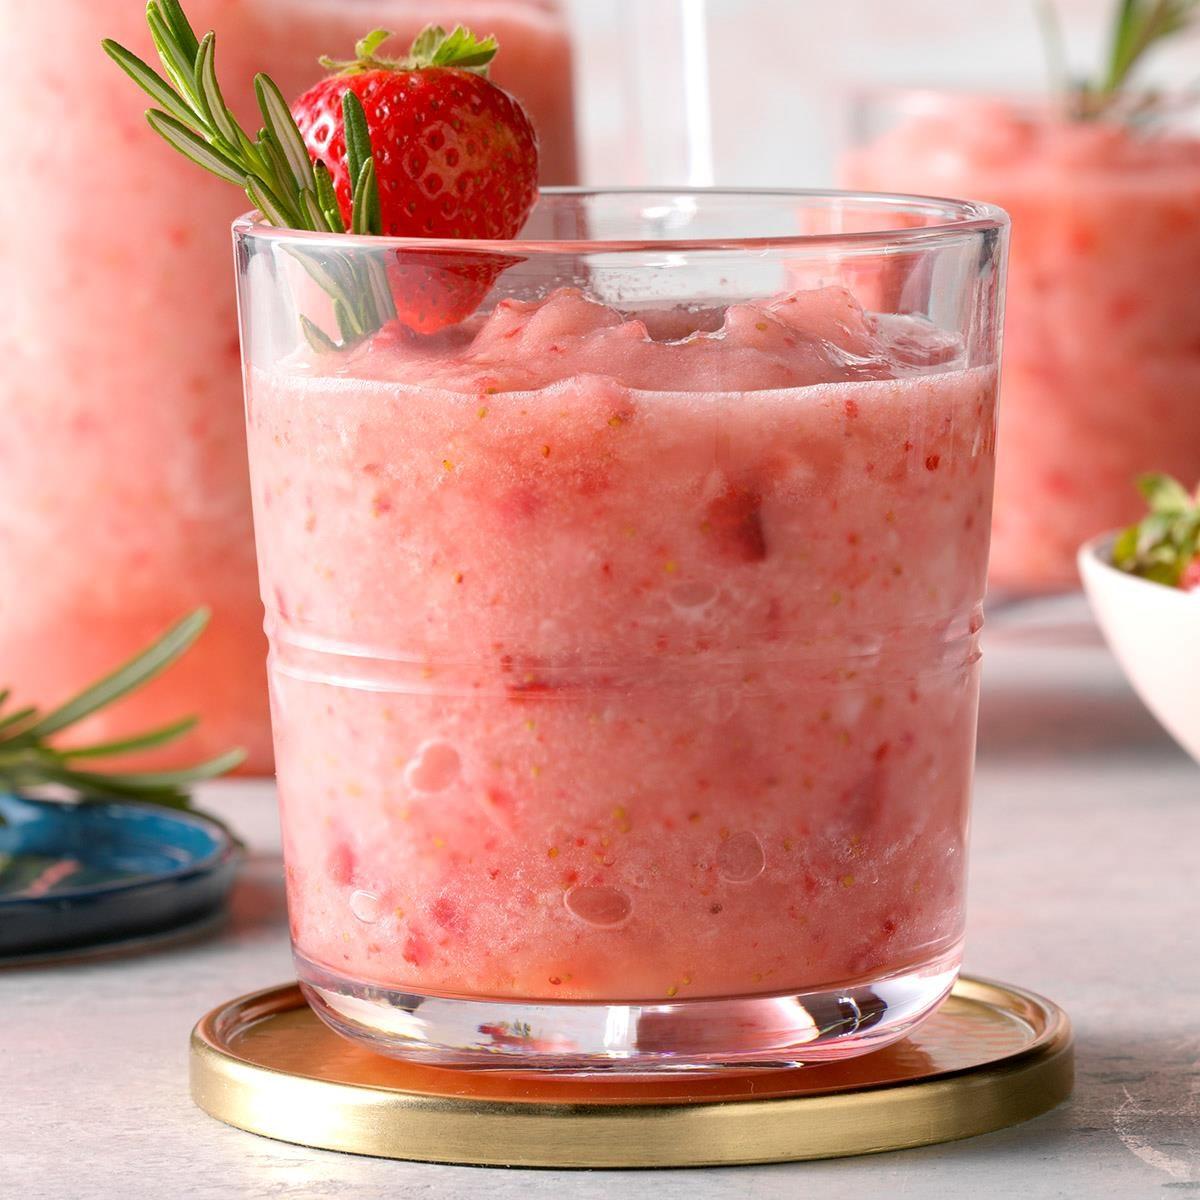 Rosemary Strawberry Daiquiri Recipe How To Make It Taste Of Home